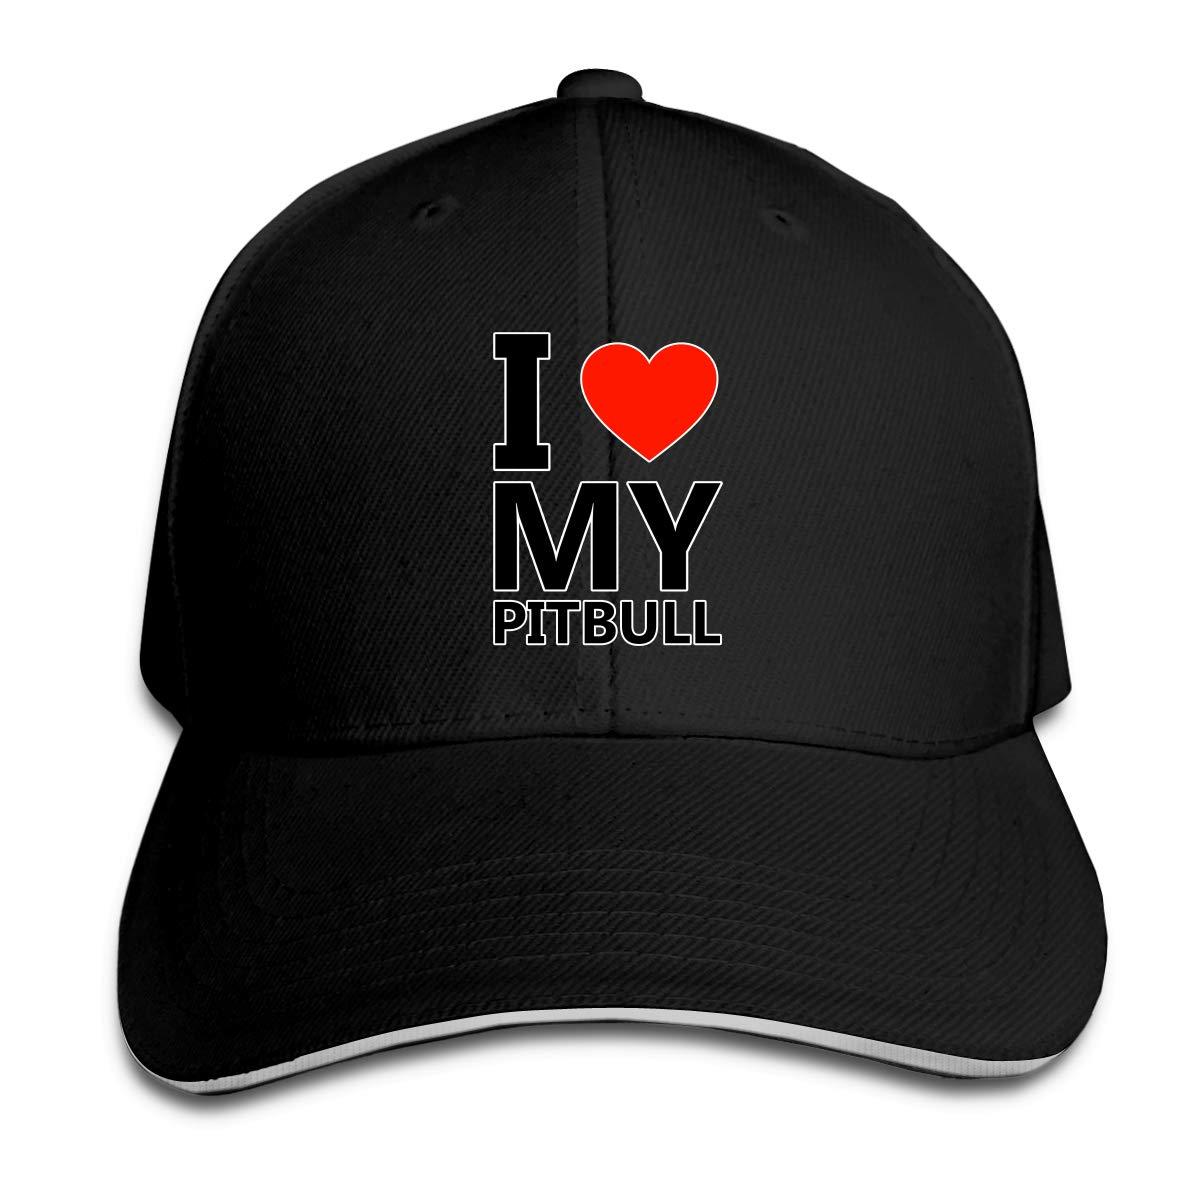 WFIRE Adult Baseball Caps I Love My Pitbull Custom Adjustable Sandwich Cap Casquette Hats